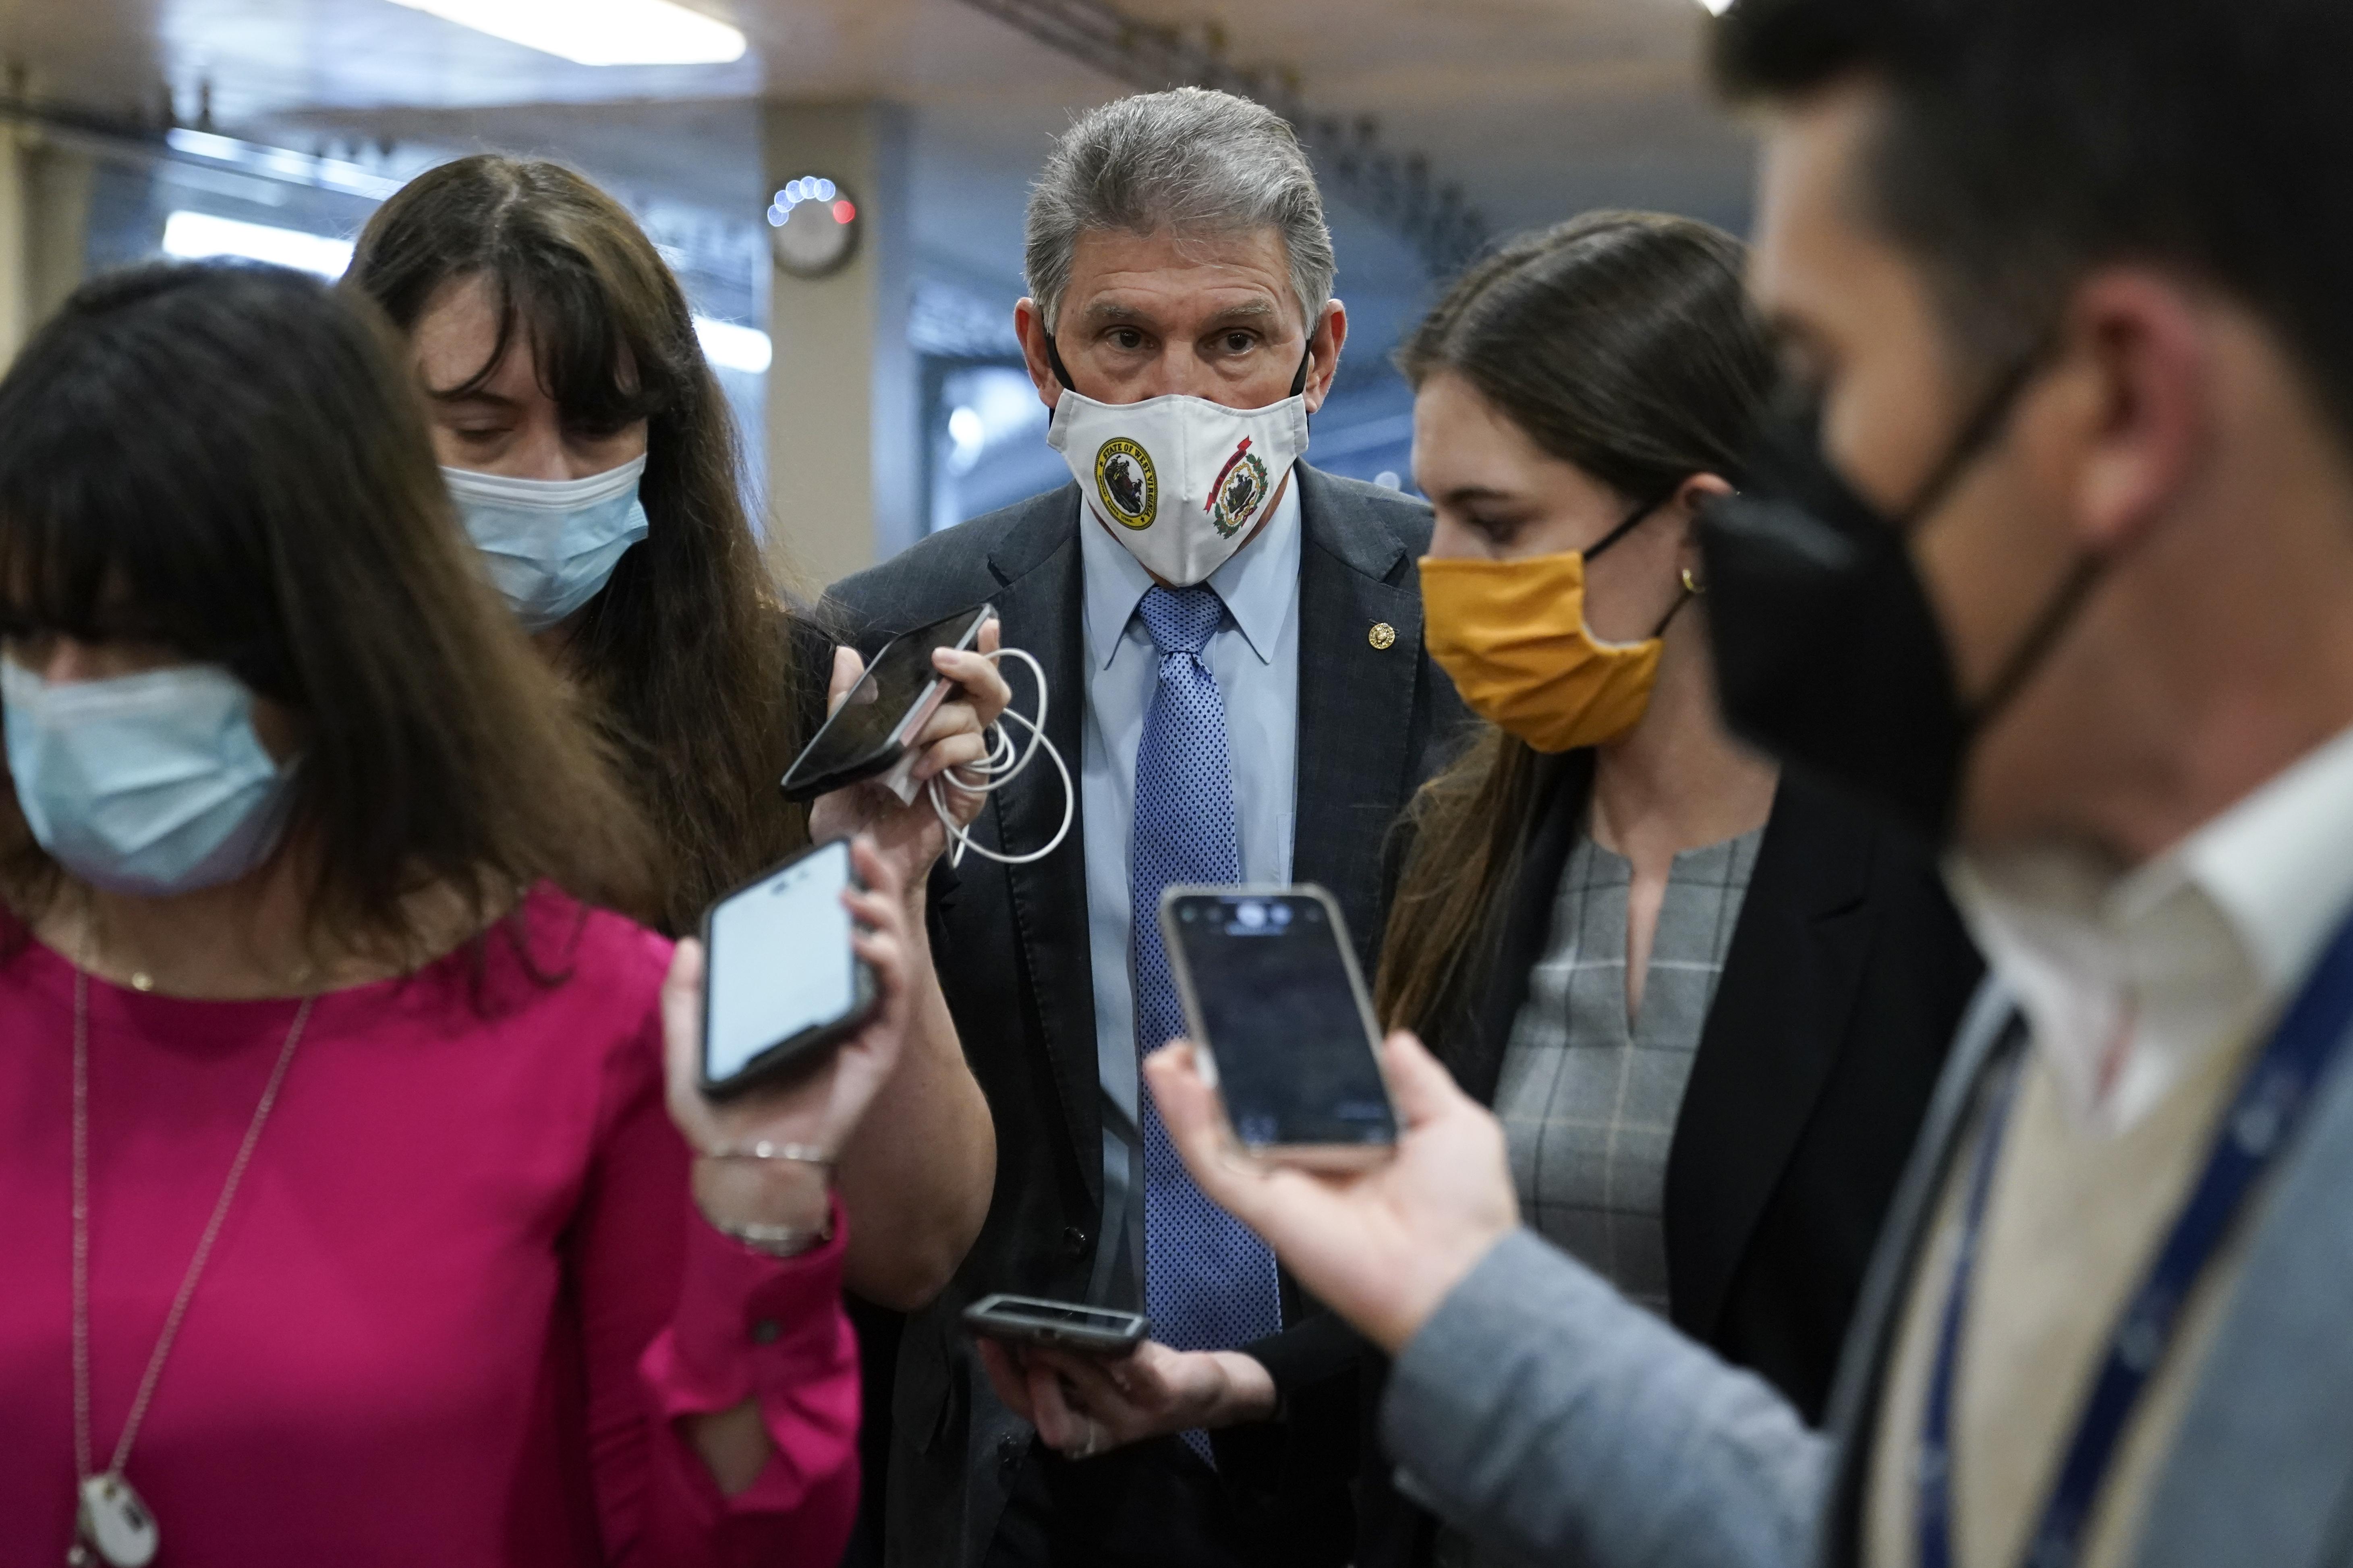 Sen. Joe Manchin, D-W.Va., center, speaks with reporters on Capitol Hill in Washington on Wednesday.